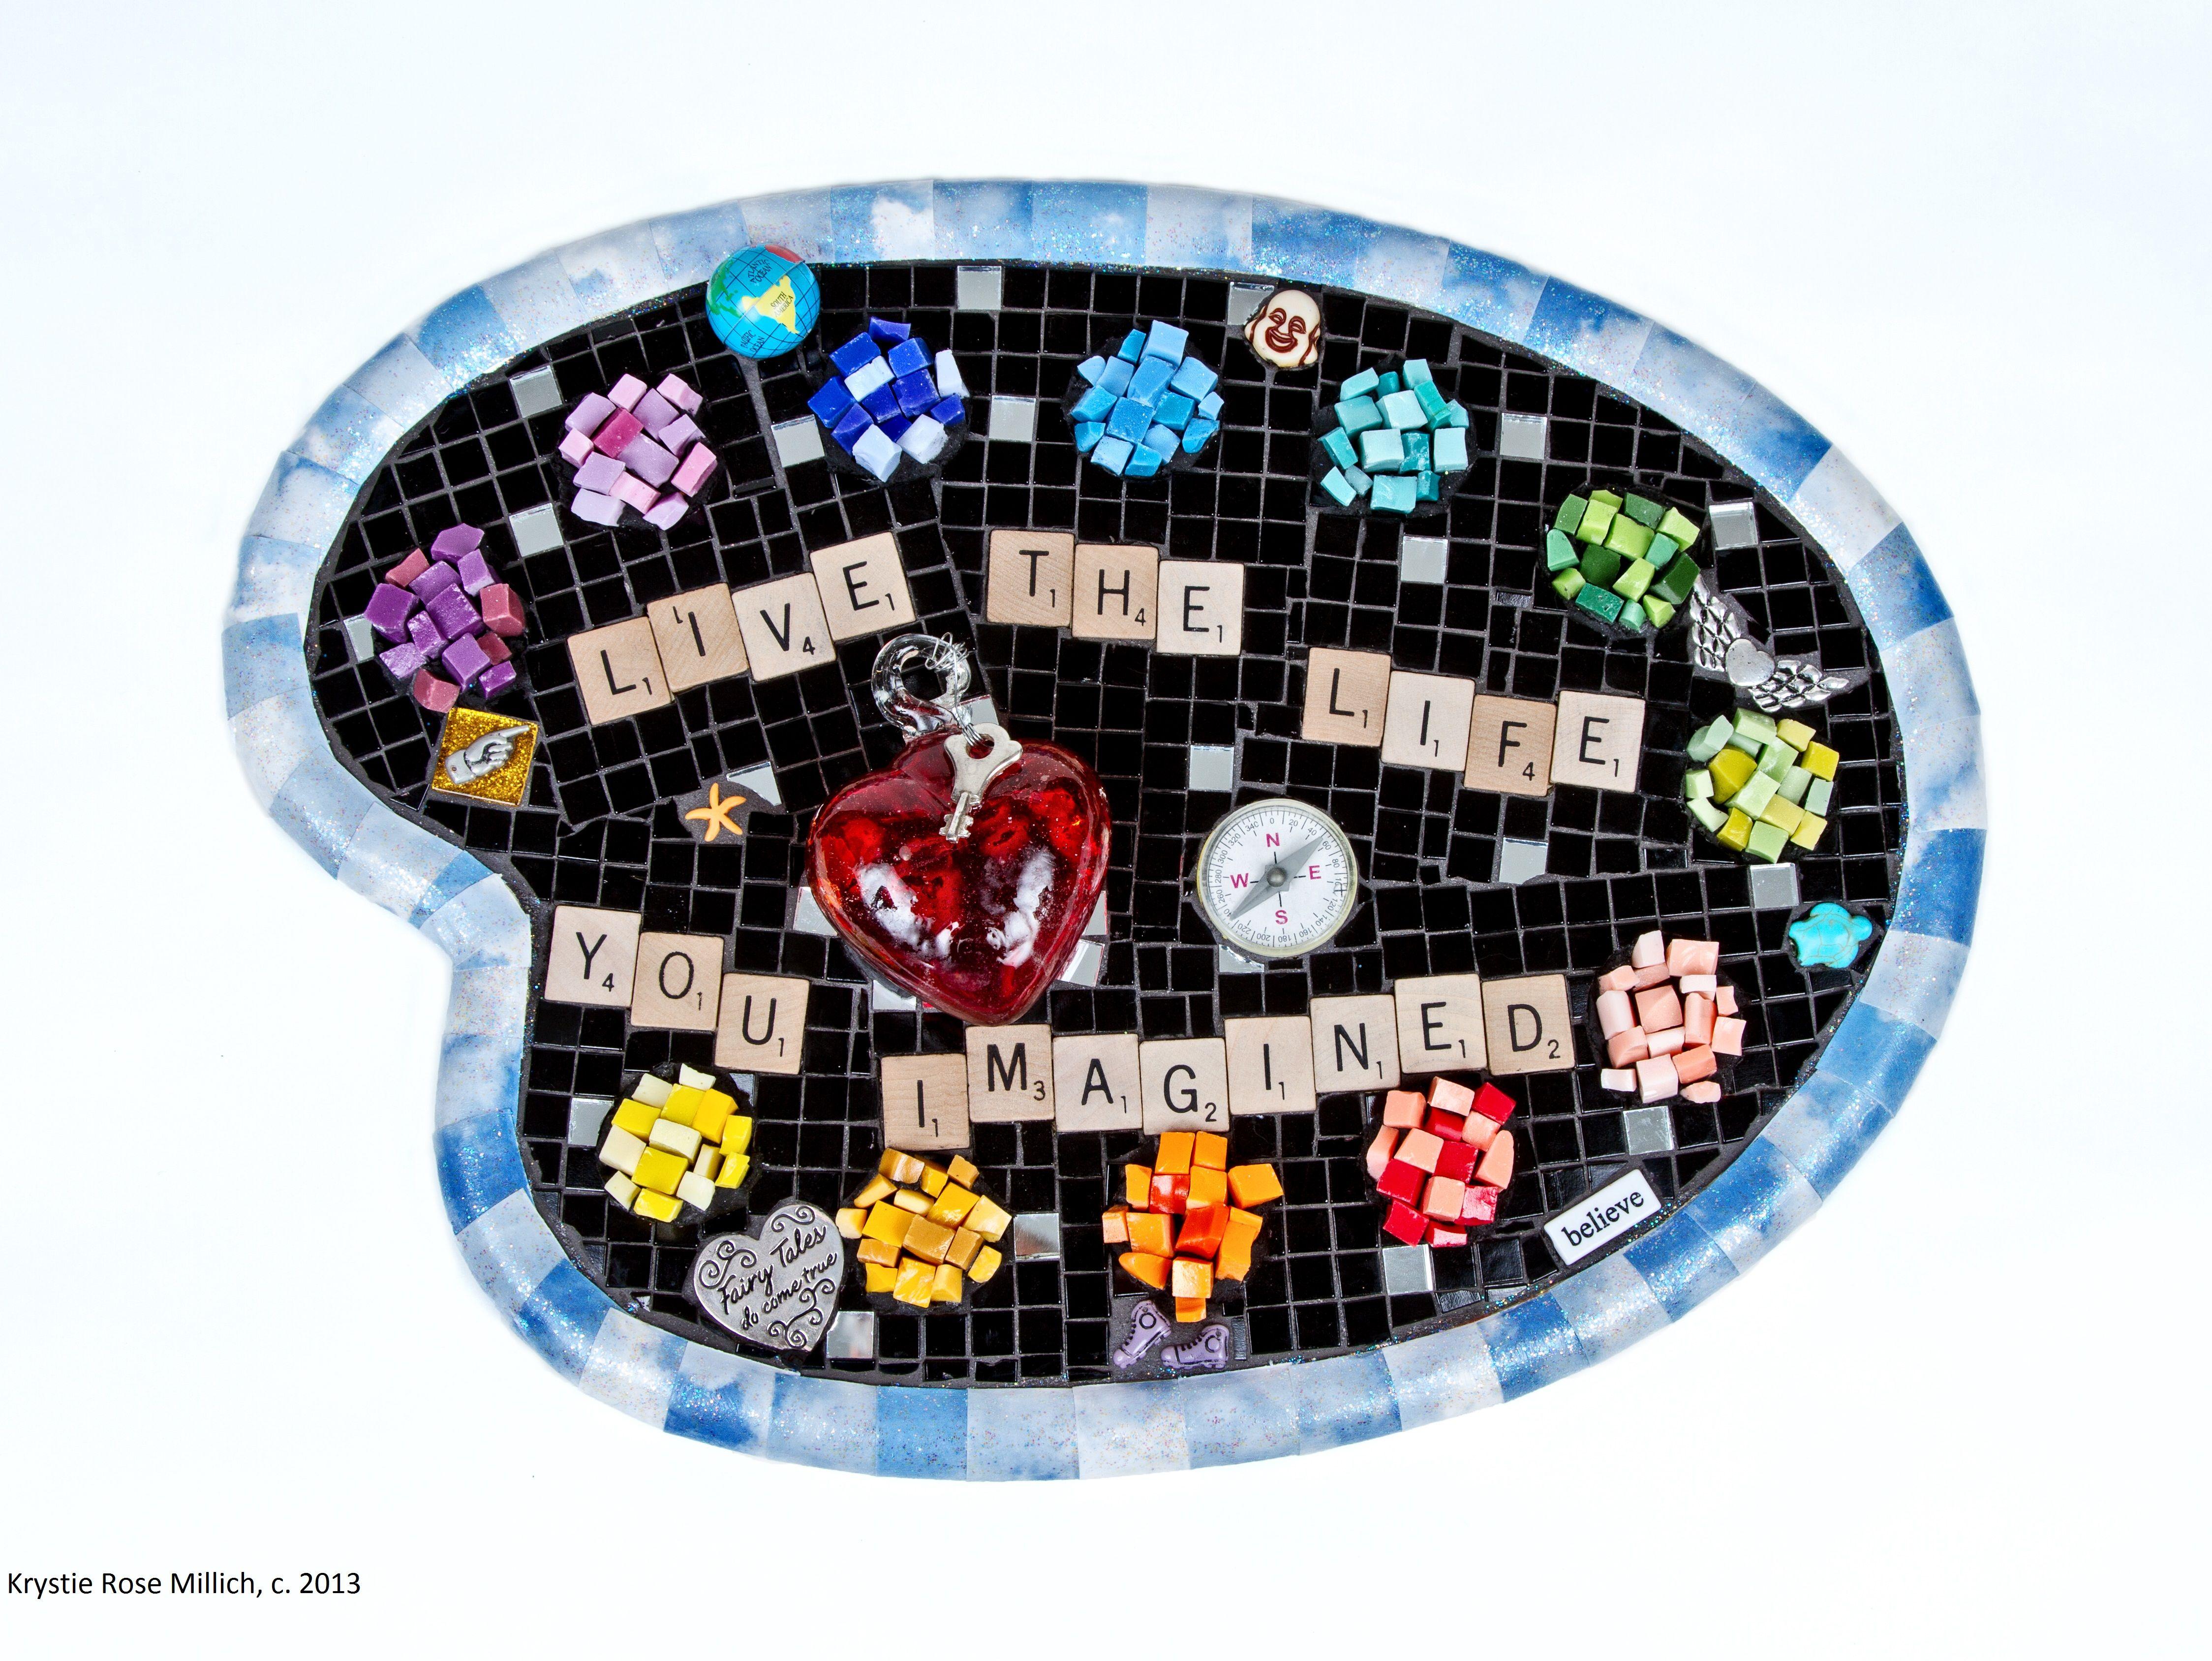 "Live the Life: c. 2013, Krystie Rose Millich. Mixed-Media Mosaic, 15x11.5x2""…"